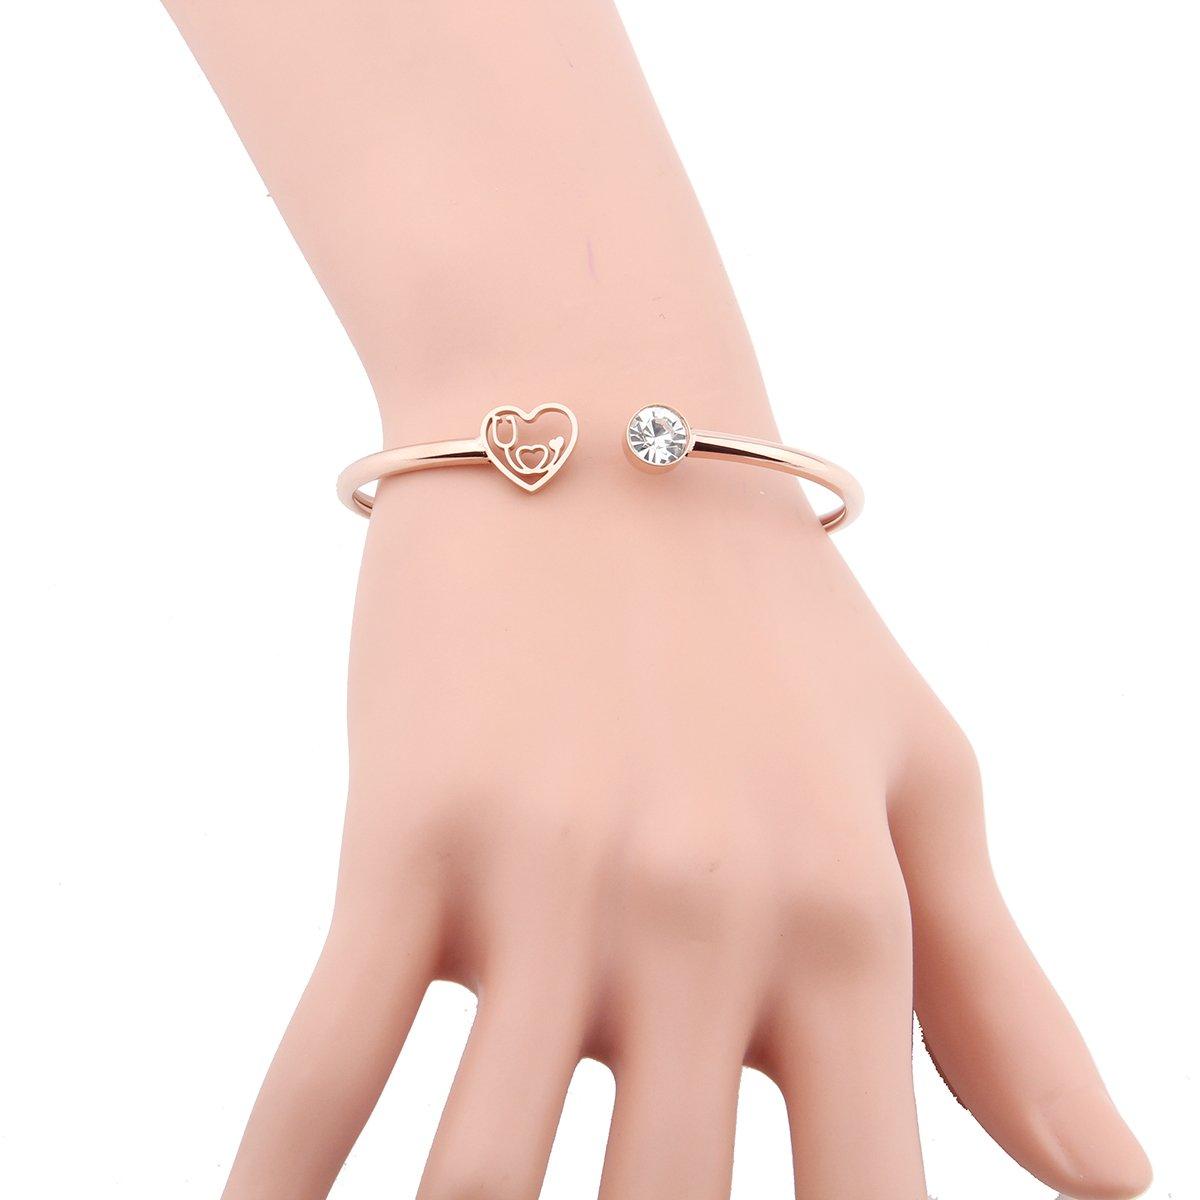 ENSIANTH Rose Gold Heartbeat Jewelry Nurse Stethoscope Bracelet Cuff Bangle for Nurse Day Gift